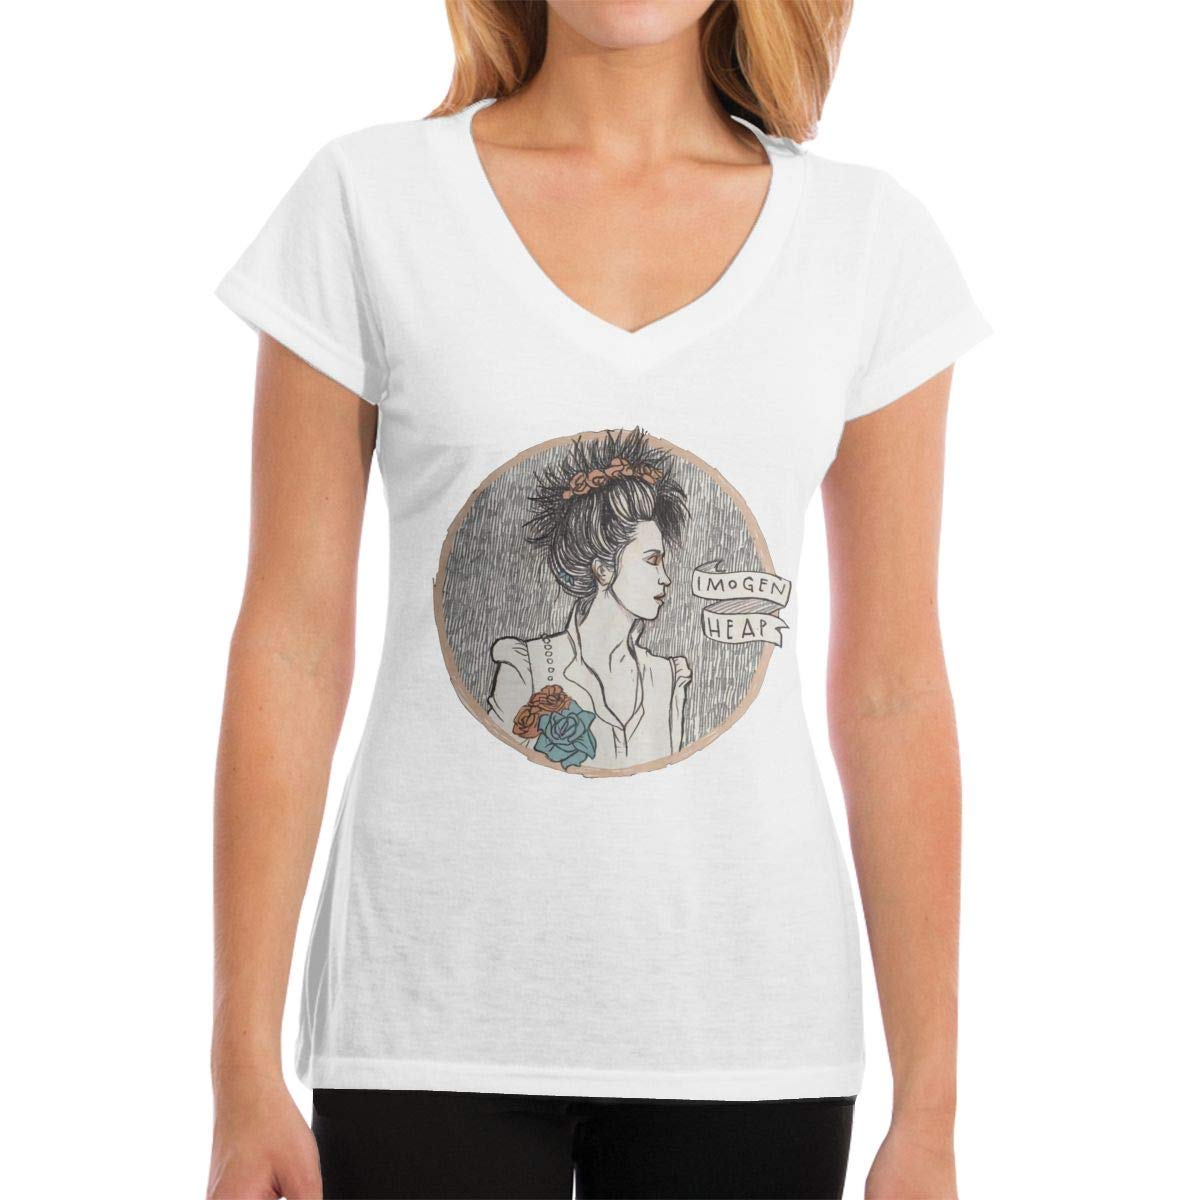 Fredrmarr Imogen Heap Line T-shirt Short Sleeve Casual Tees